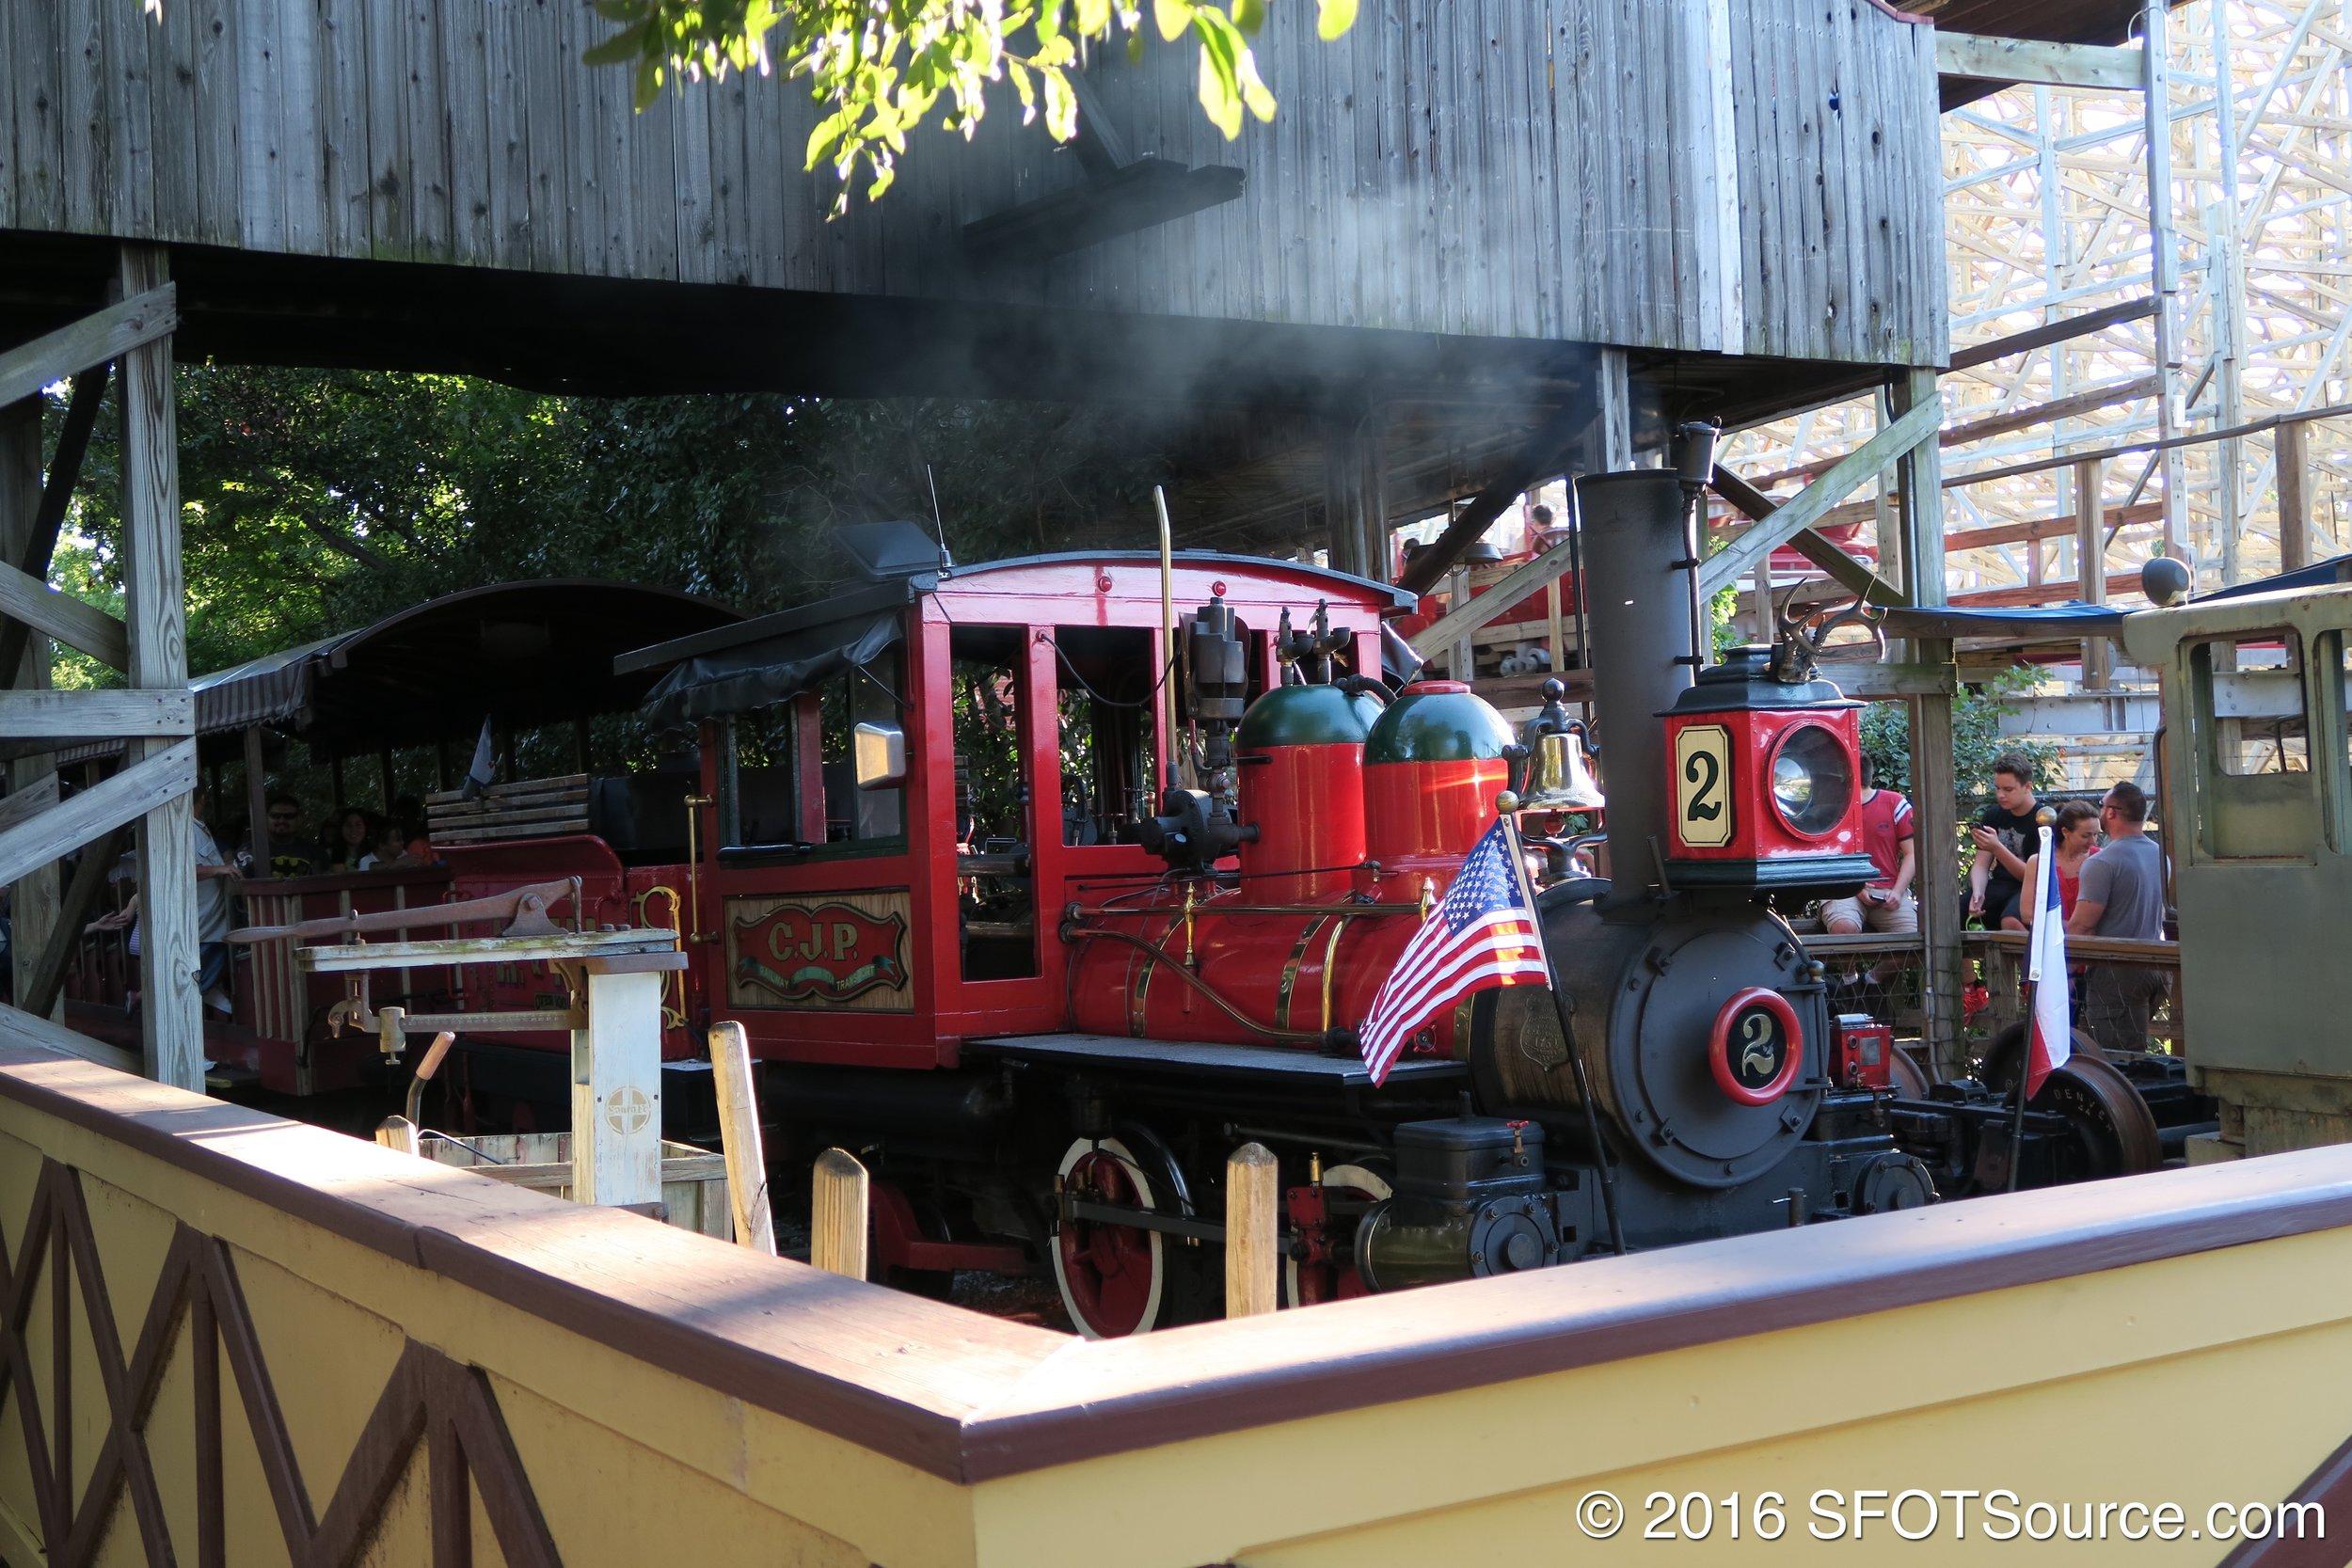 A train awaits passengers.